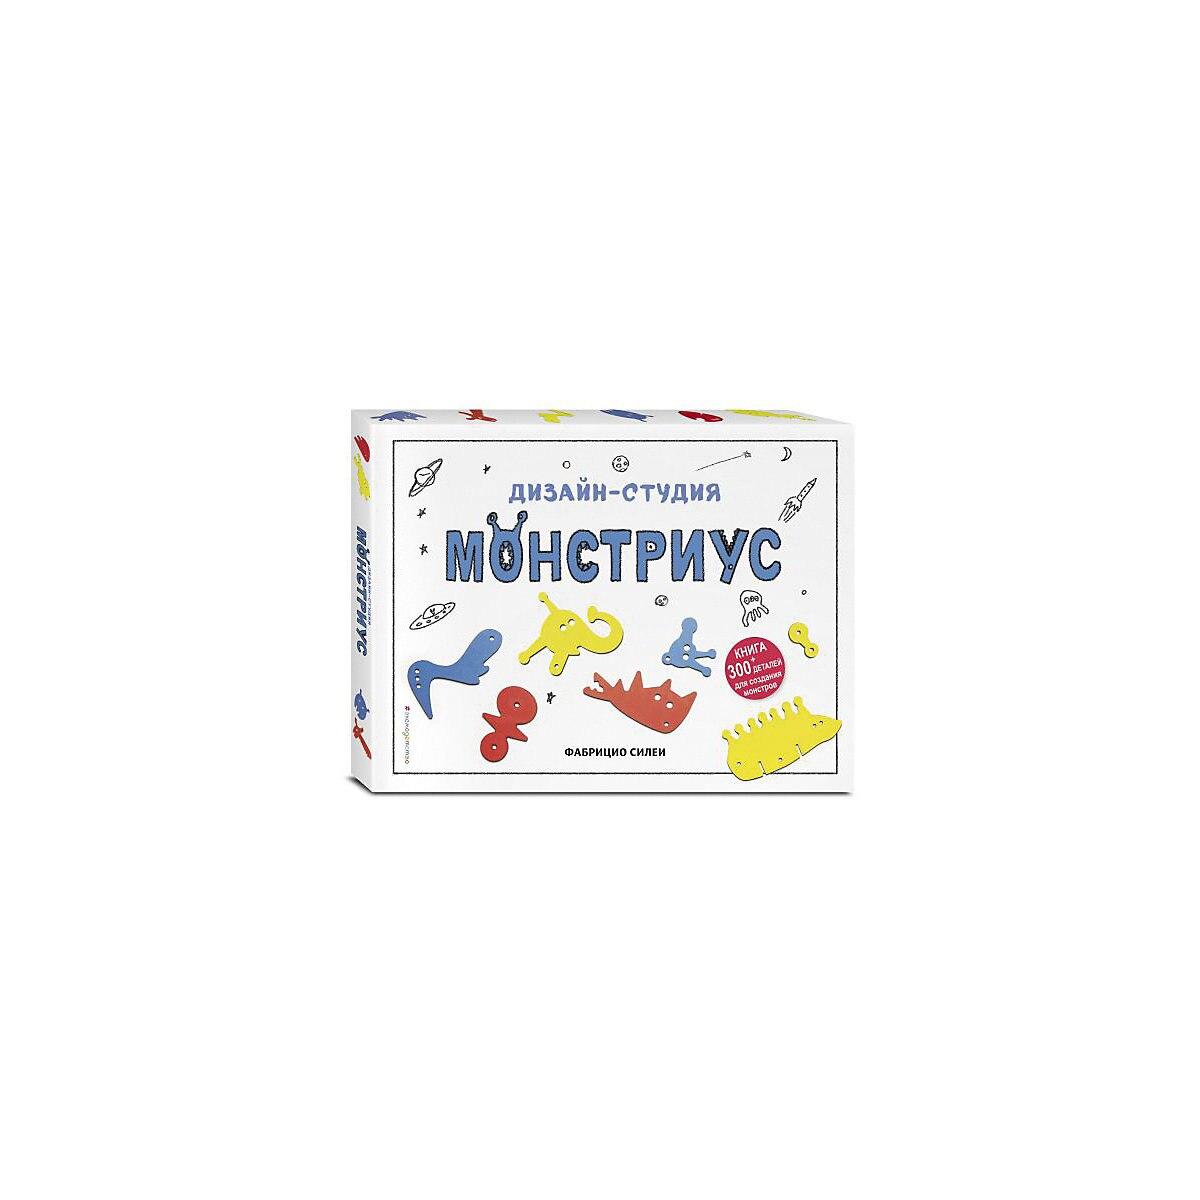 Books EKSMO 8676374 Children Education Encyclopedia Alphabet Dictionary Book For Baby MTpromo